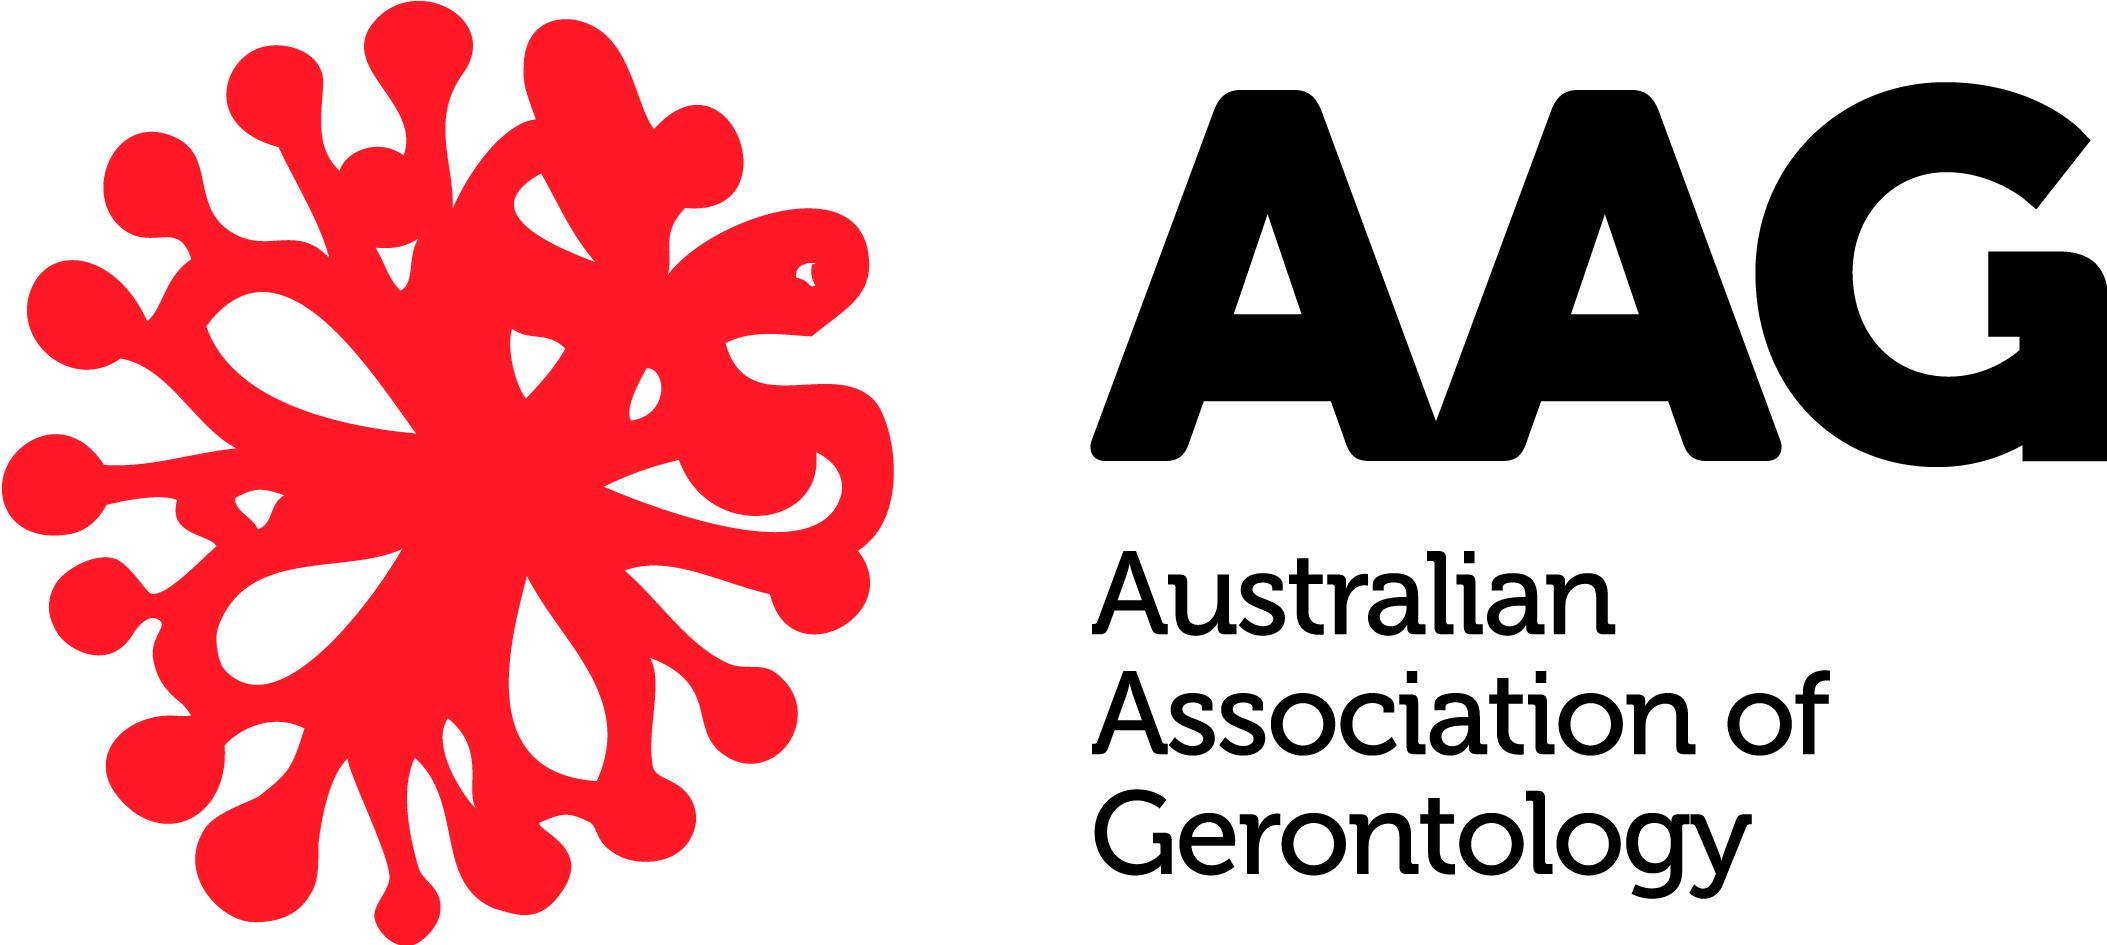 AAG_Logo_Large_jpg.jpg